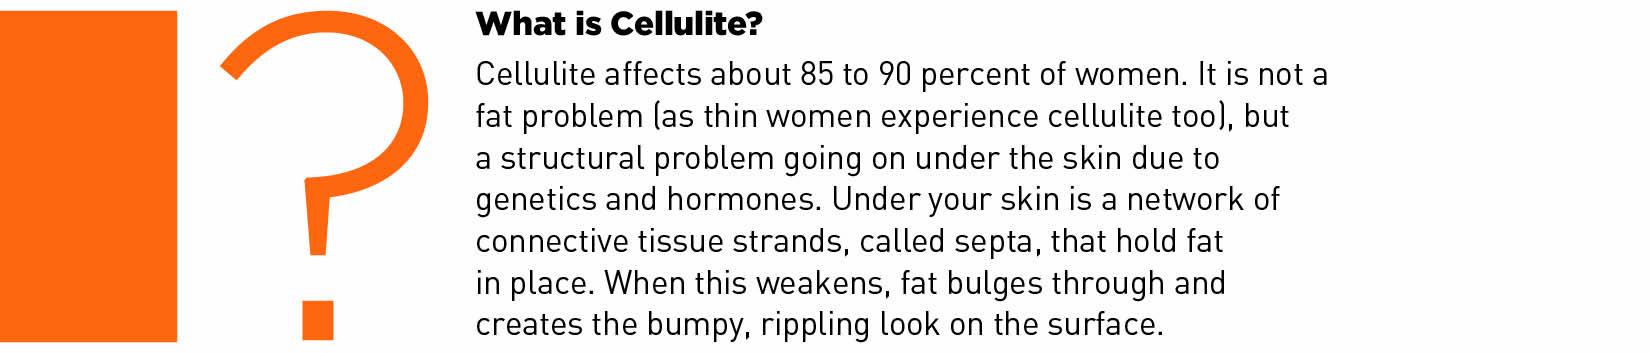 3-16 Beauty_Cellulite_web3